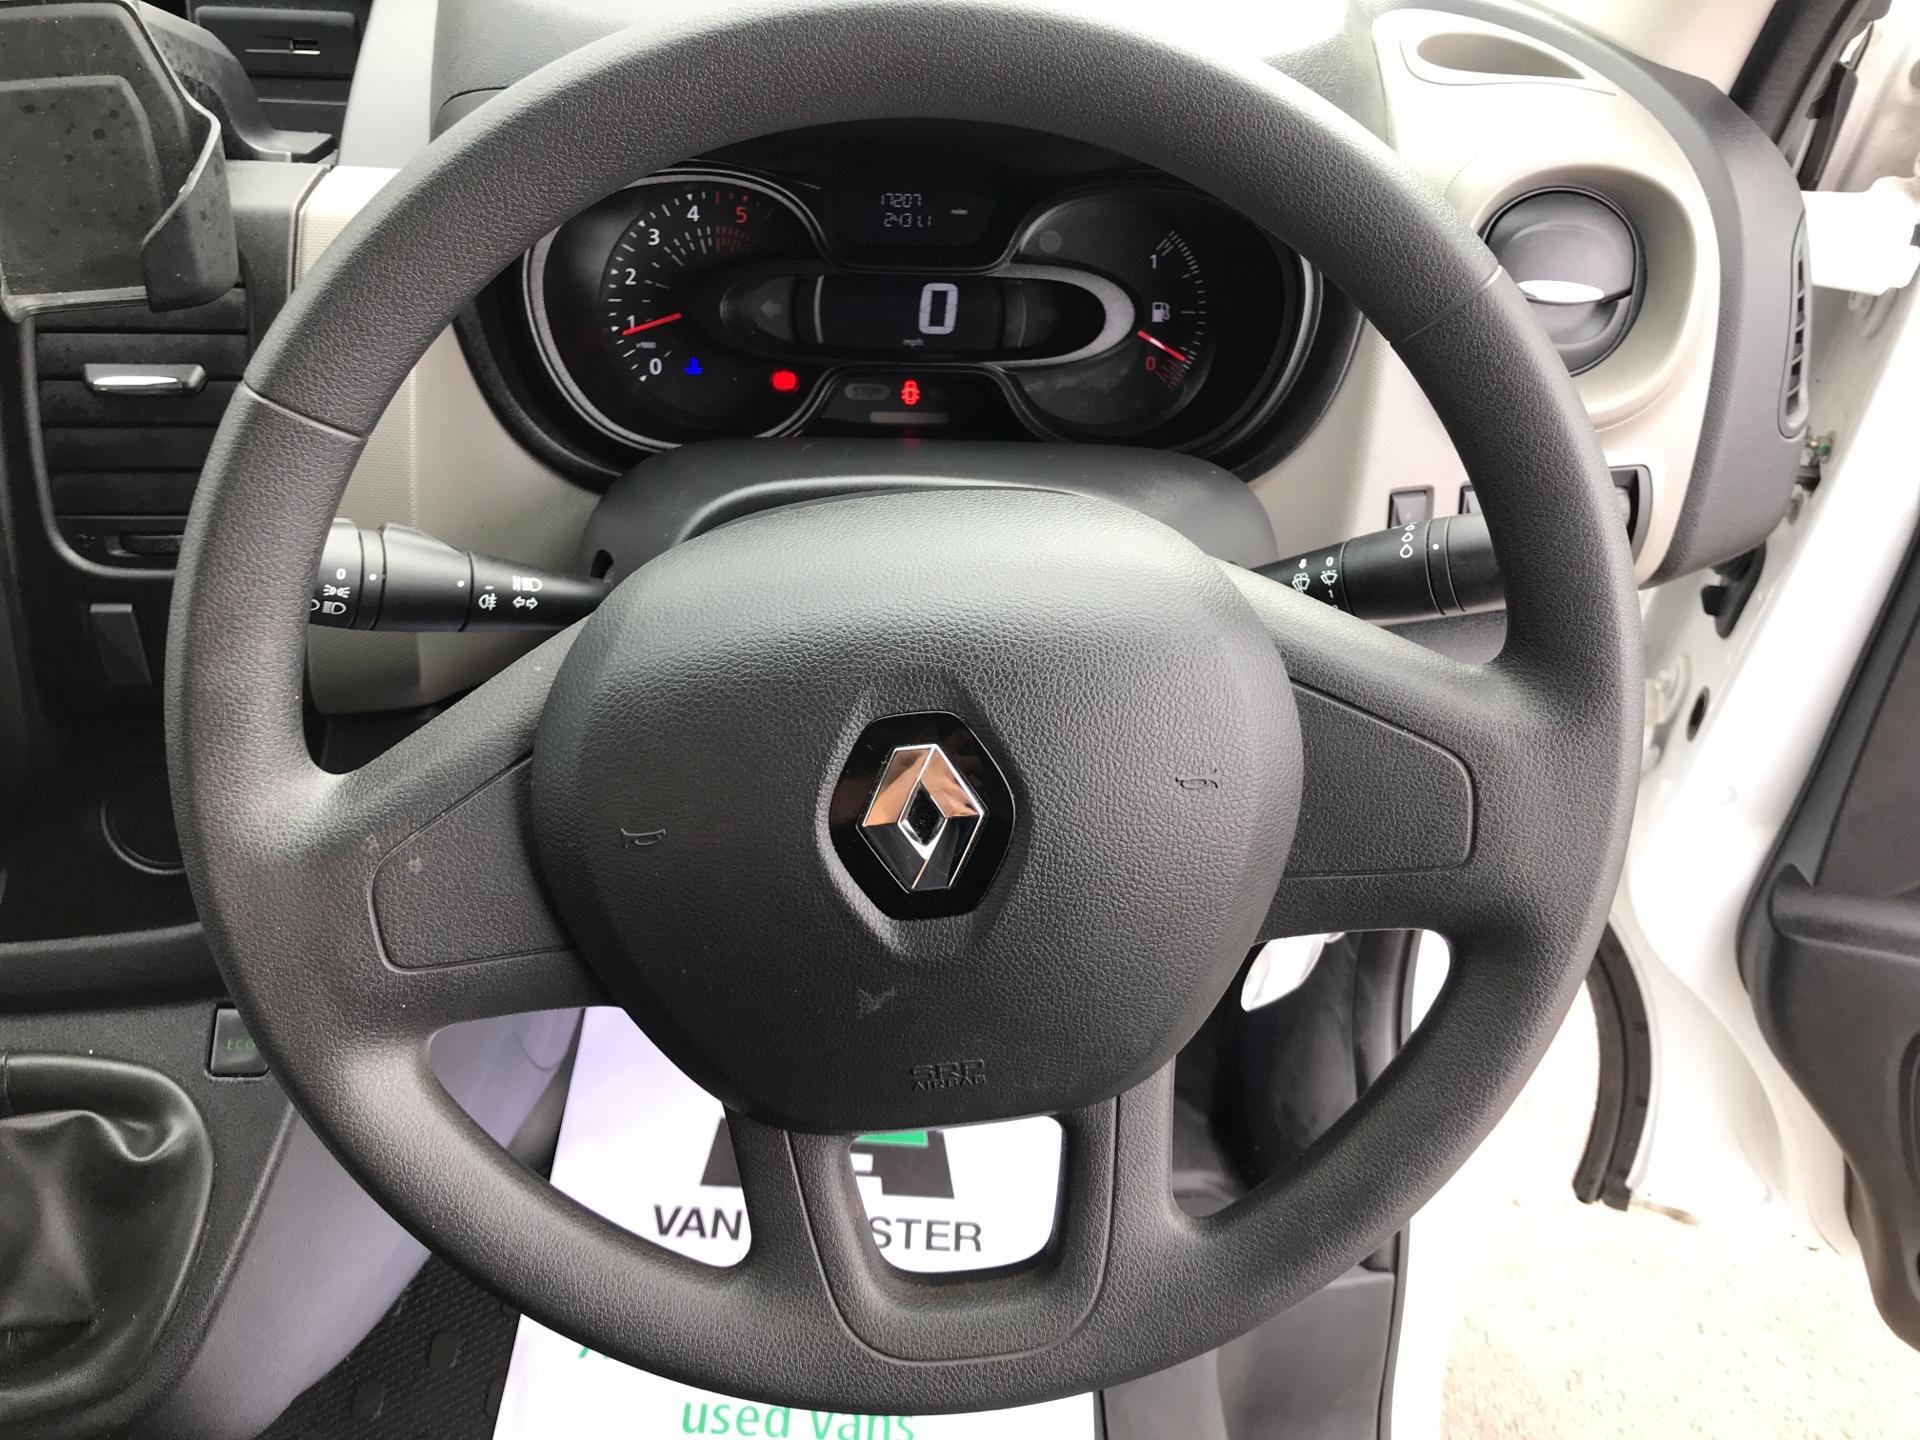 2017 Renault Trafic SL27dCi 120 BUSINESS+ VAN EURO 6 (FY67ODU) Image 12